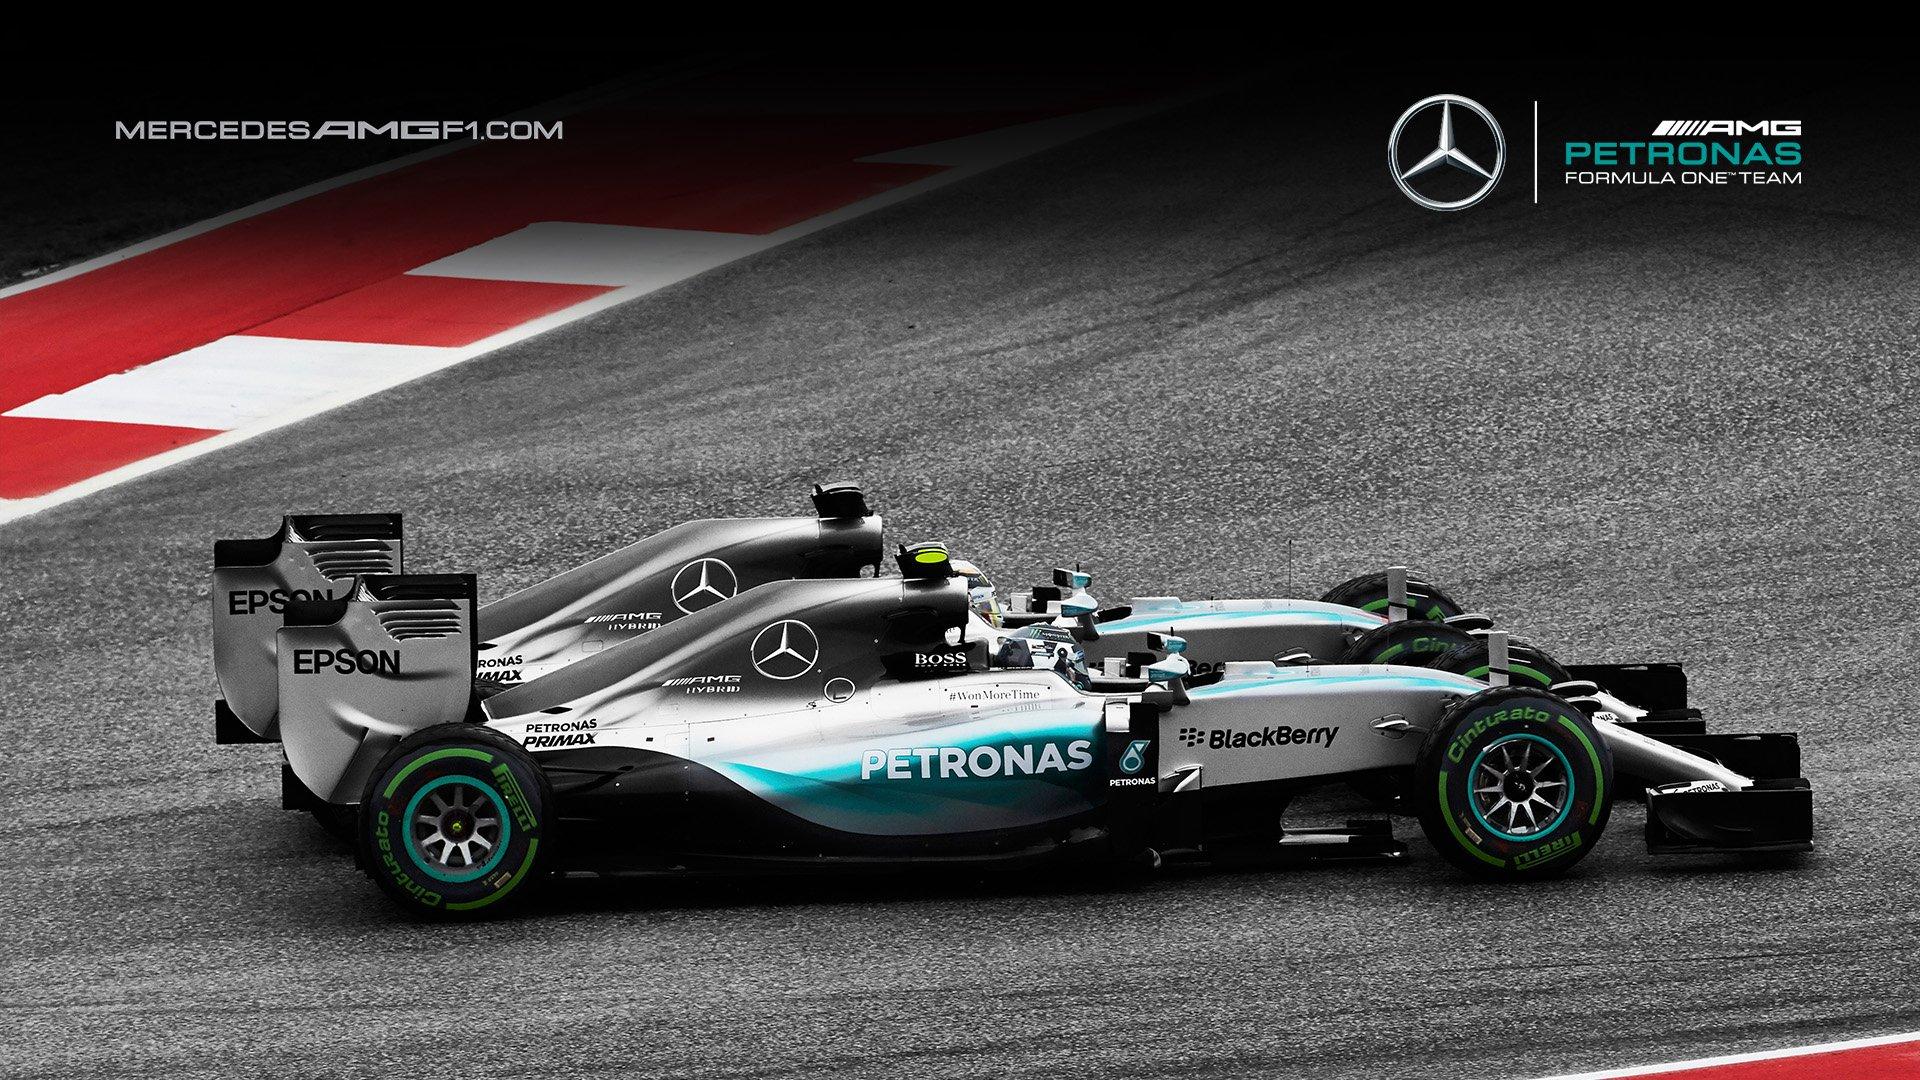 Mercedes amg petronas mercedes amg f1 for Mercedes benz petronas